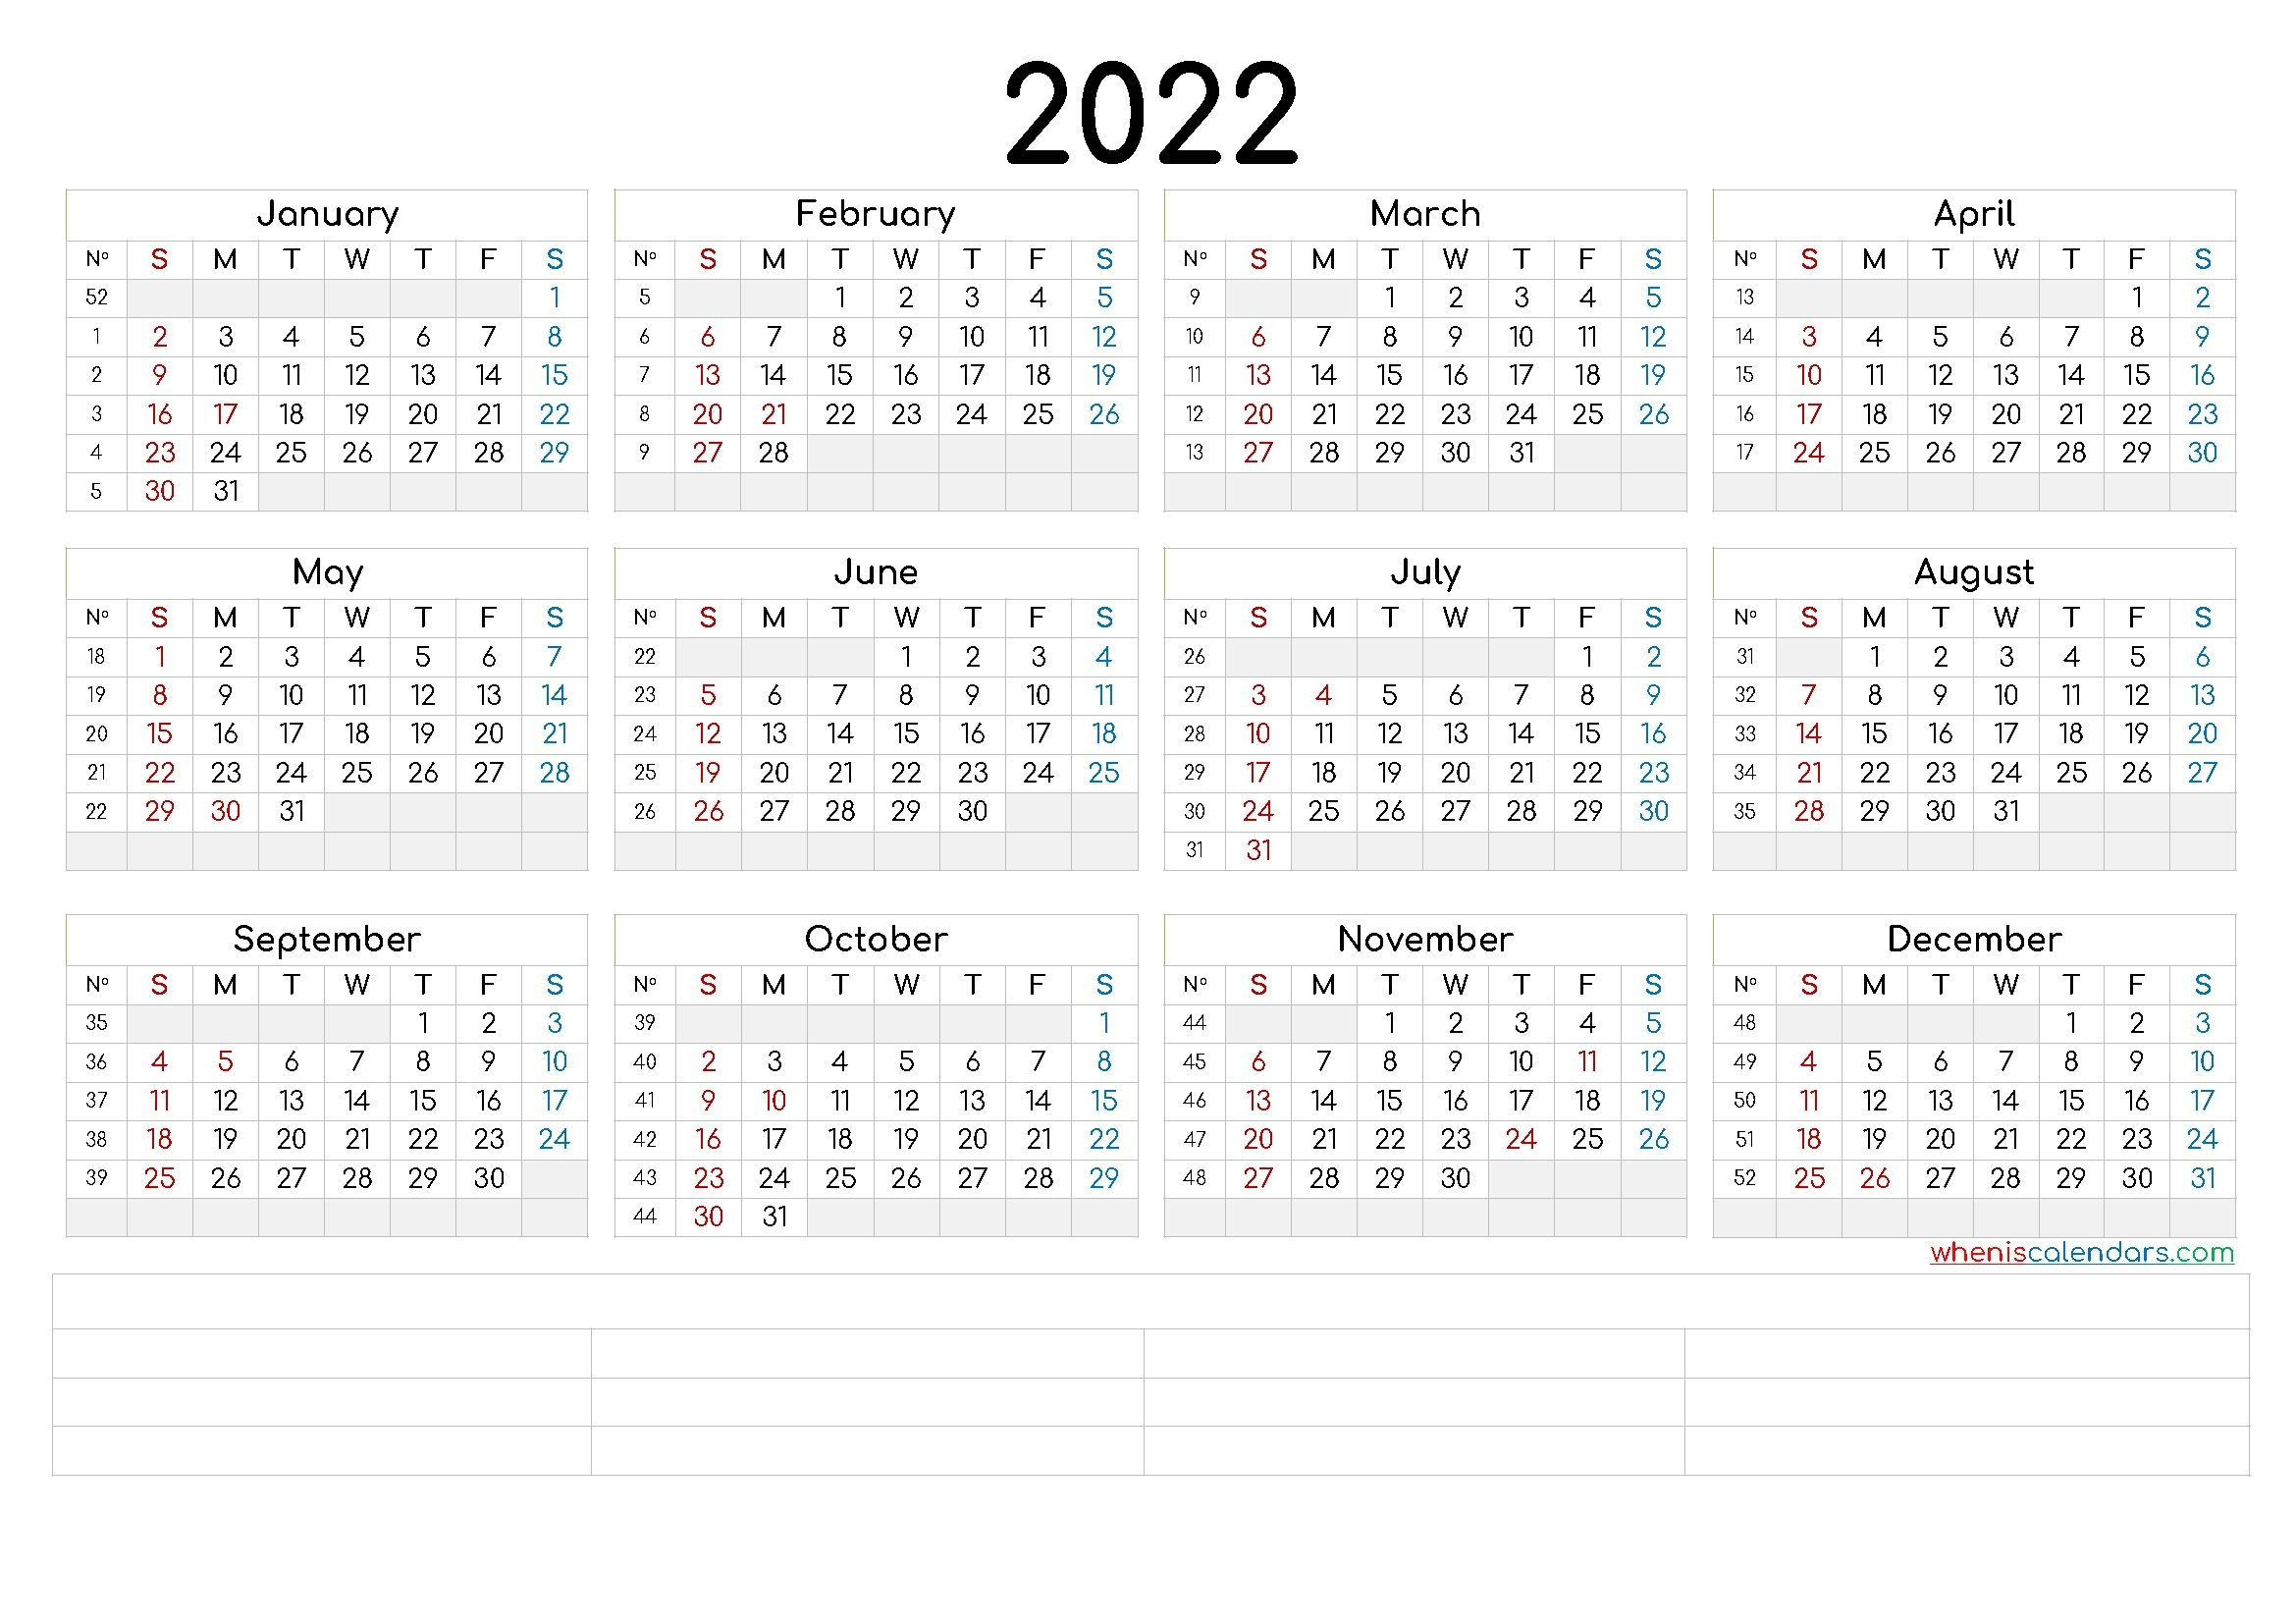 2022 Annual Calendar Printable (6 Templates)